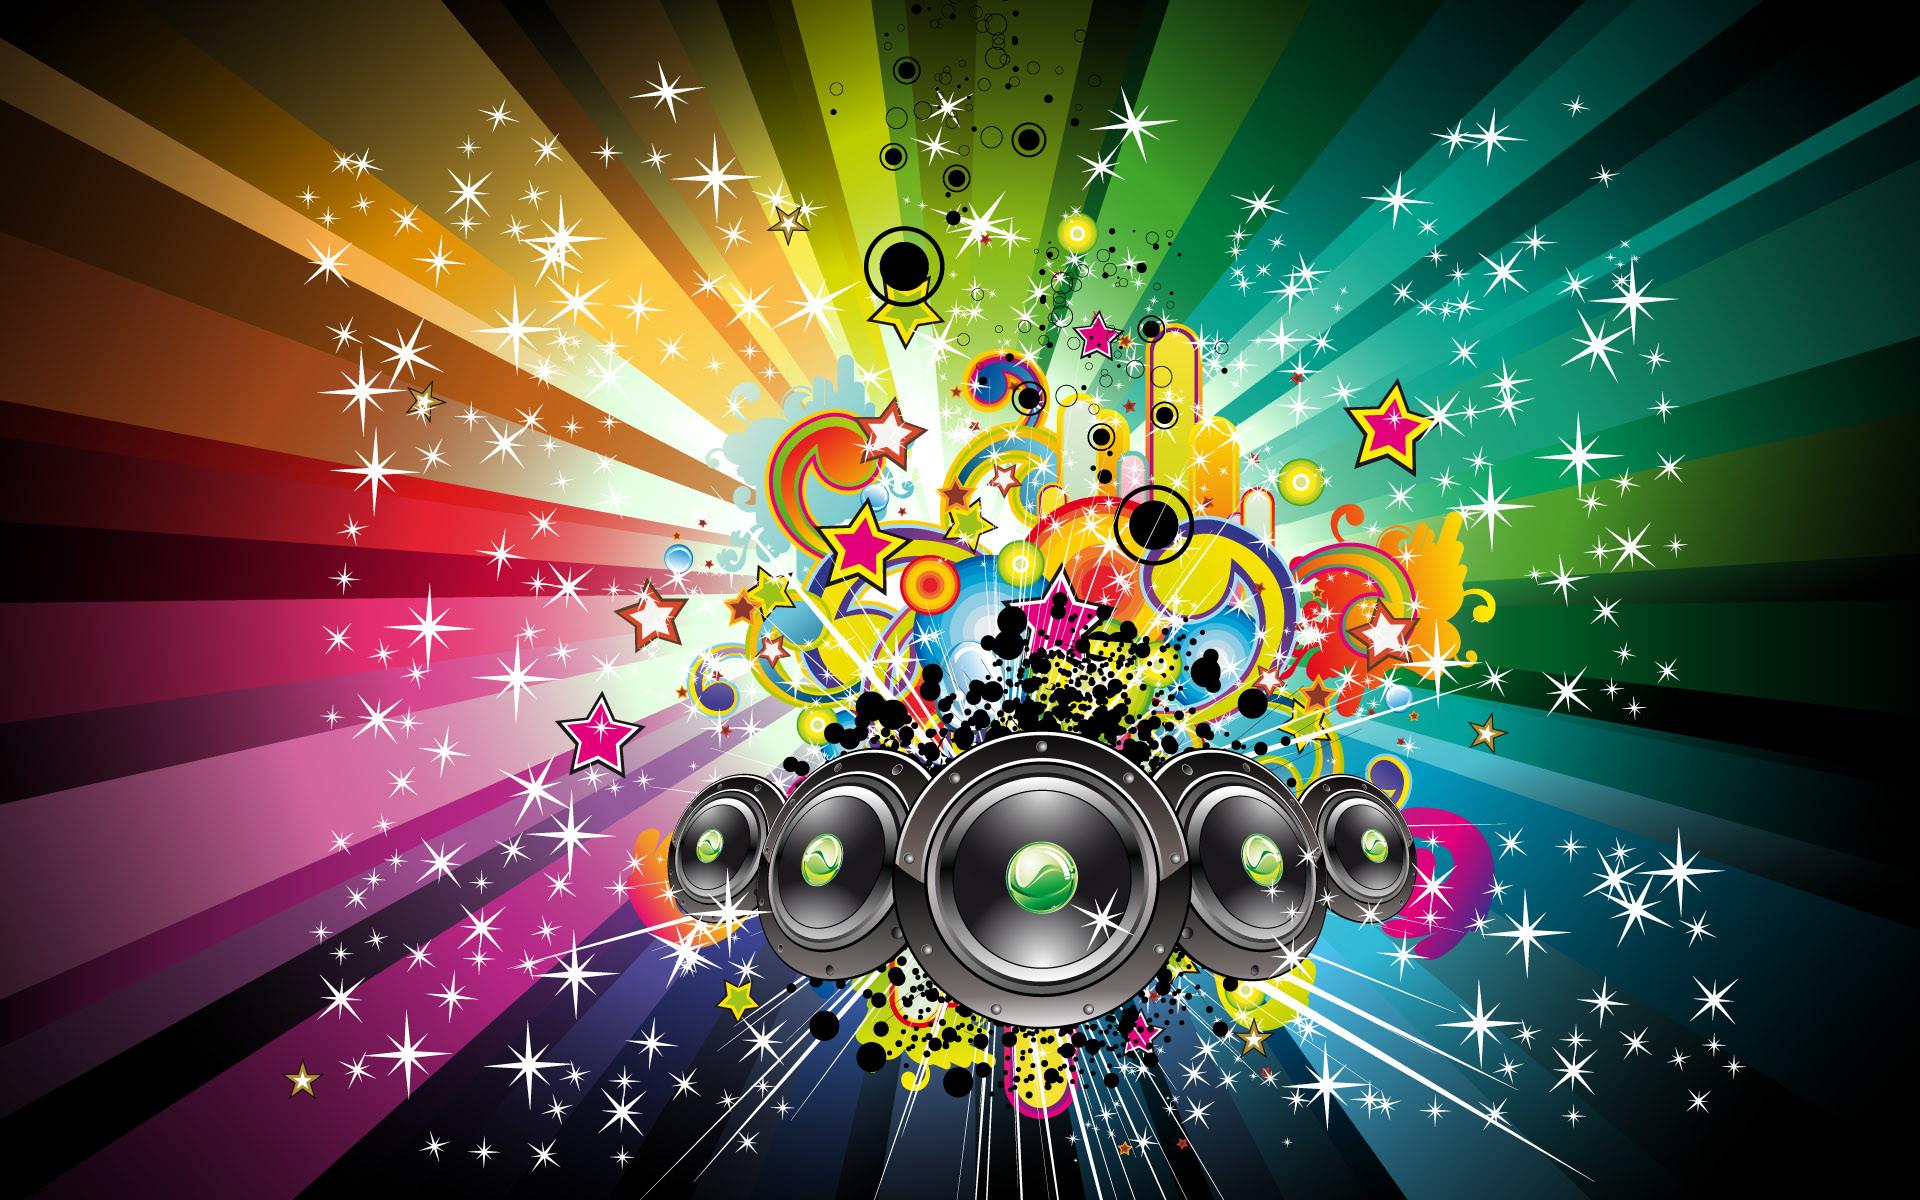 Music Wallpapers For Desktop d 1600×1200 3D Wallpapers Music (61 Wallpapers)  |